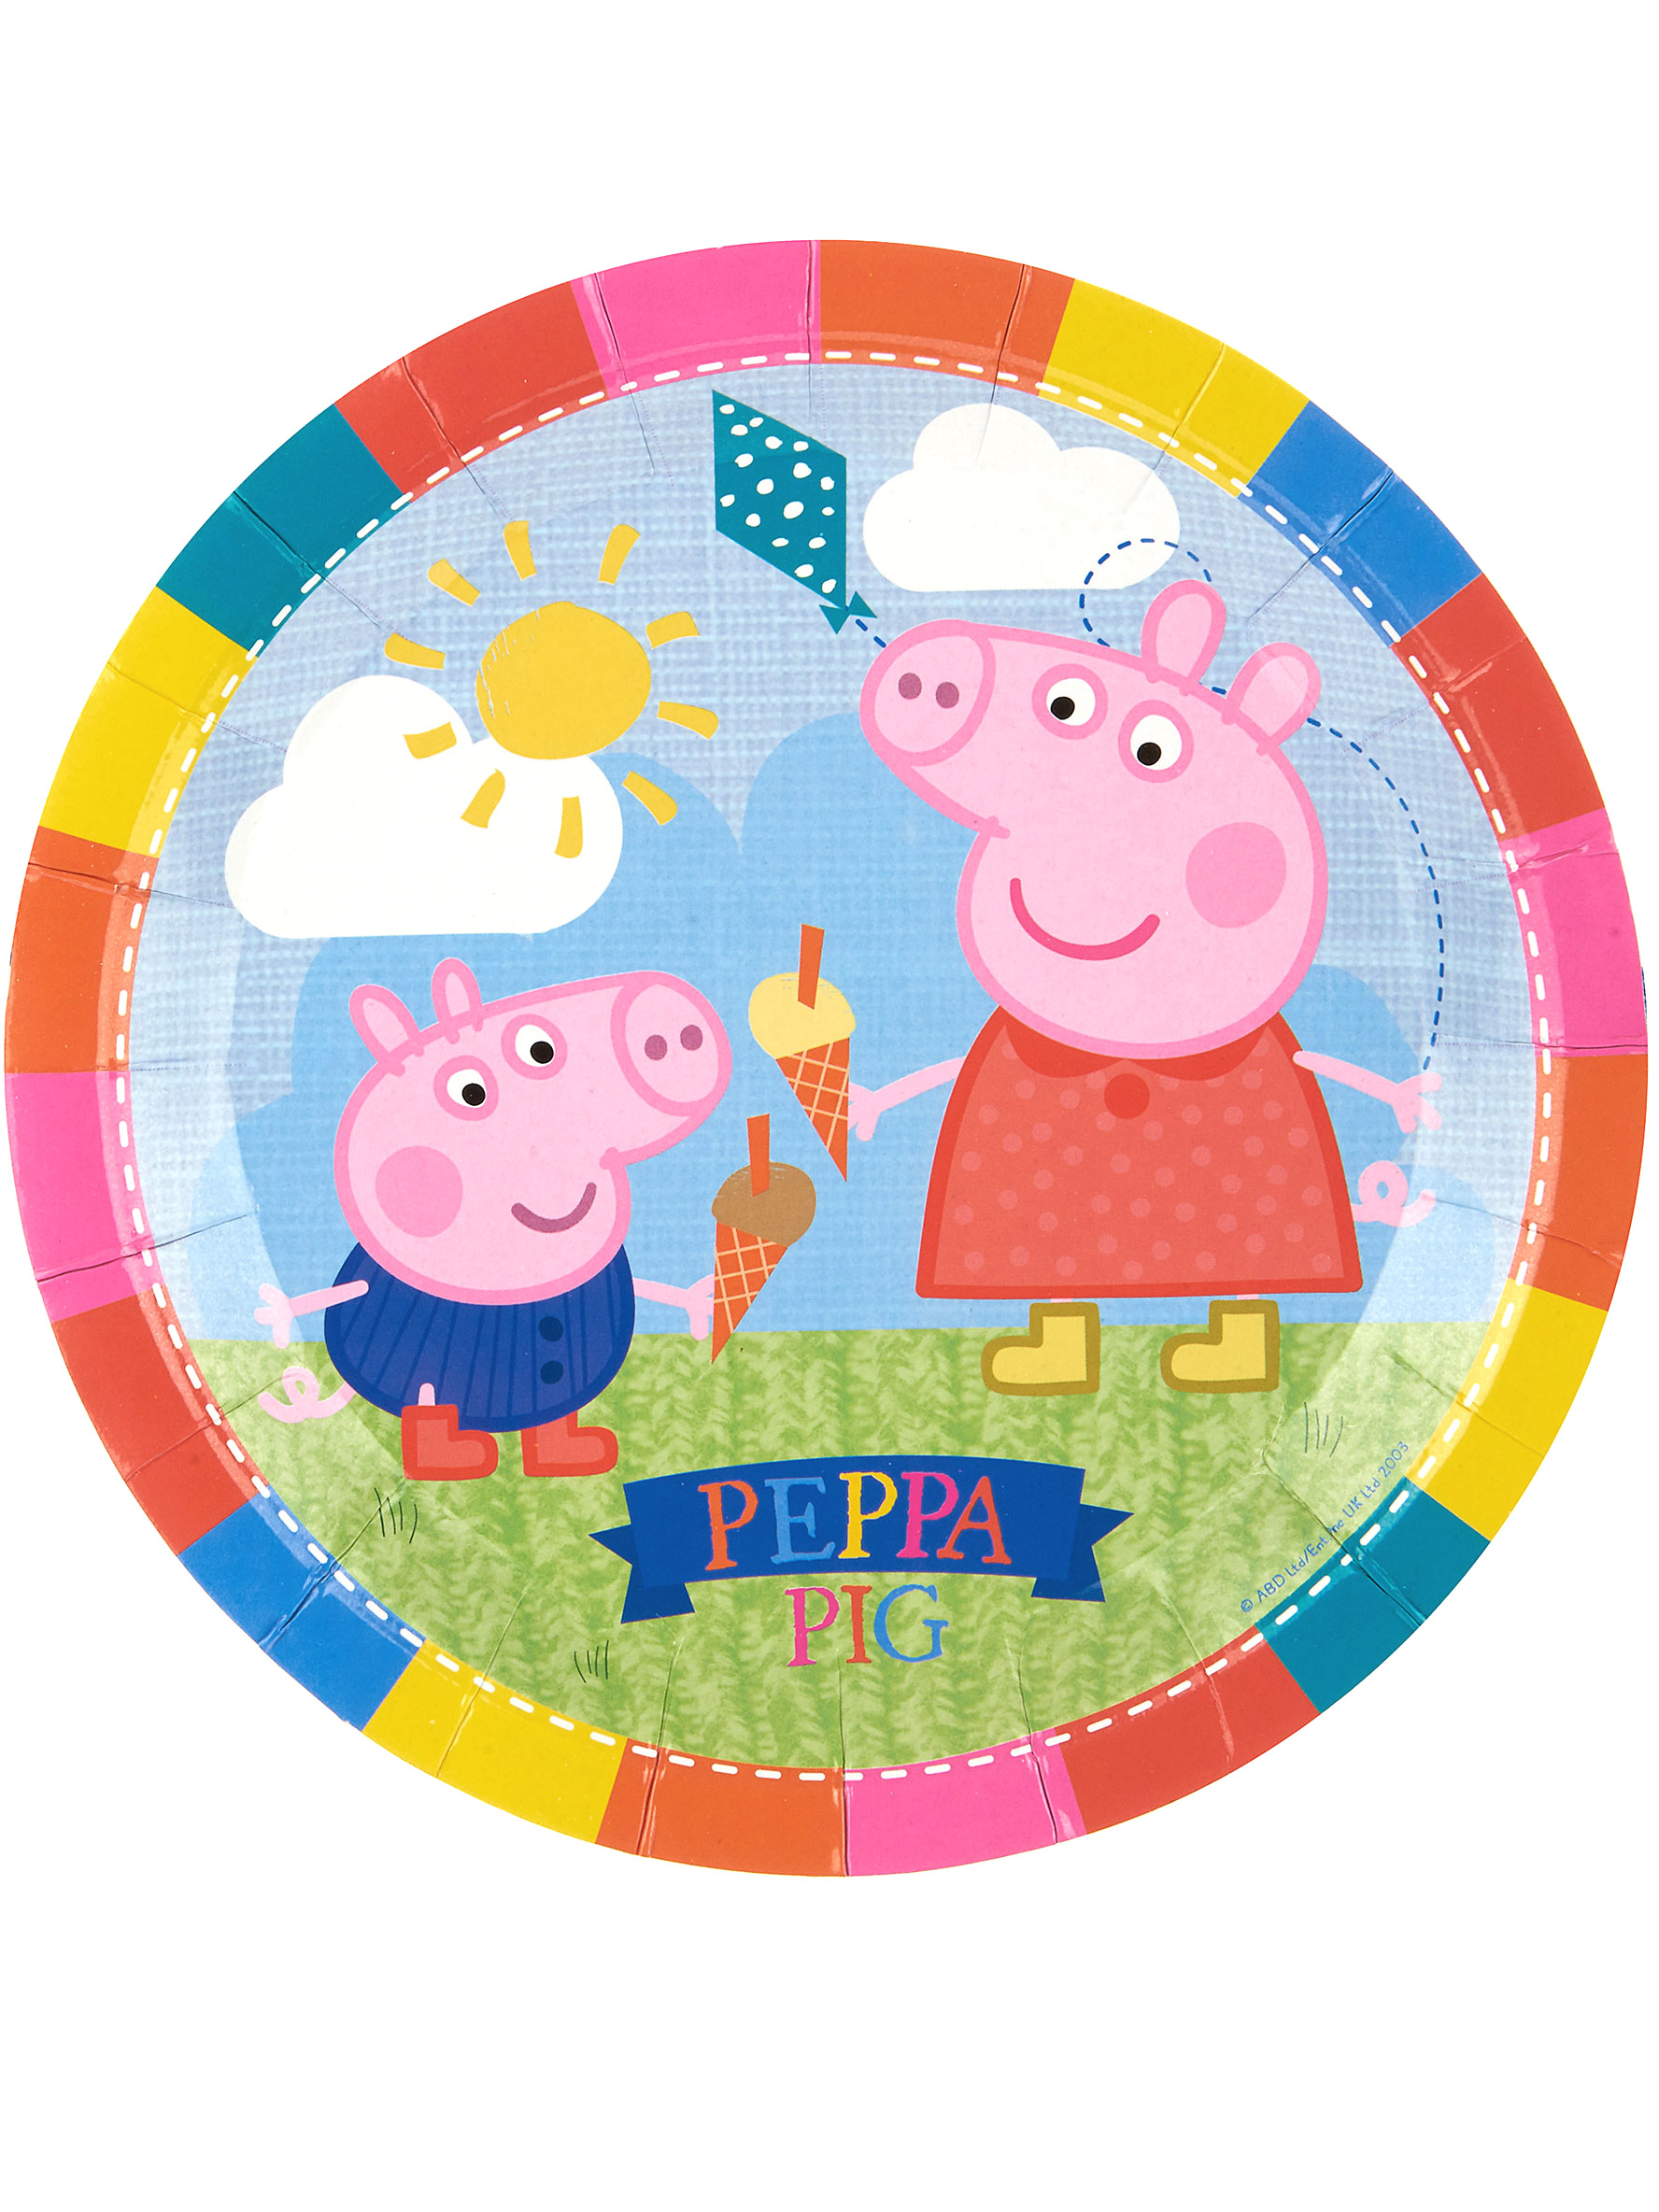 8 Platos De Cart 243 N Peppa Pig Decoraci 243 N Y Disfraces